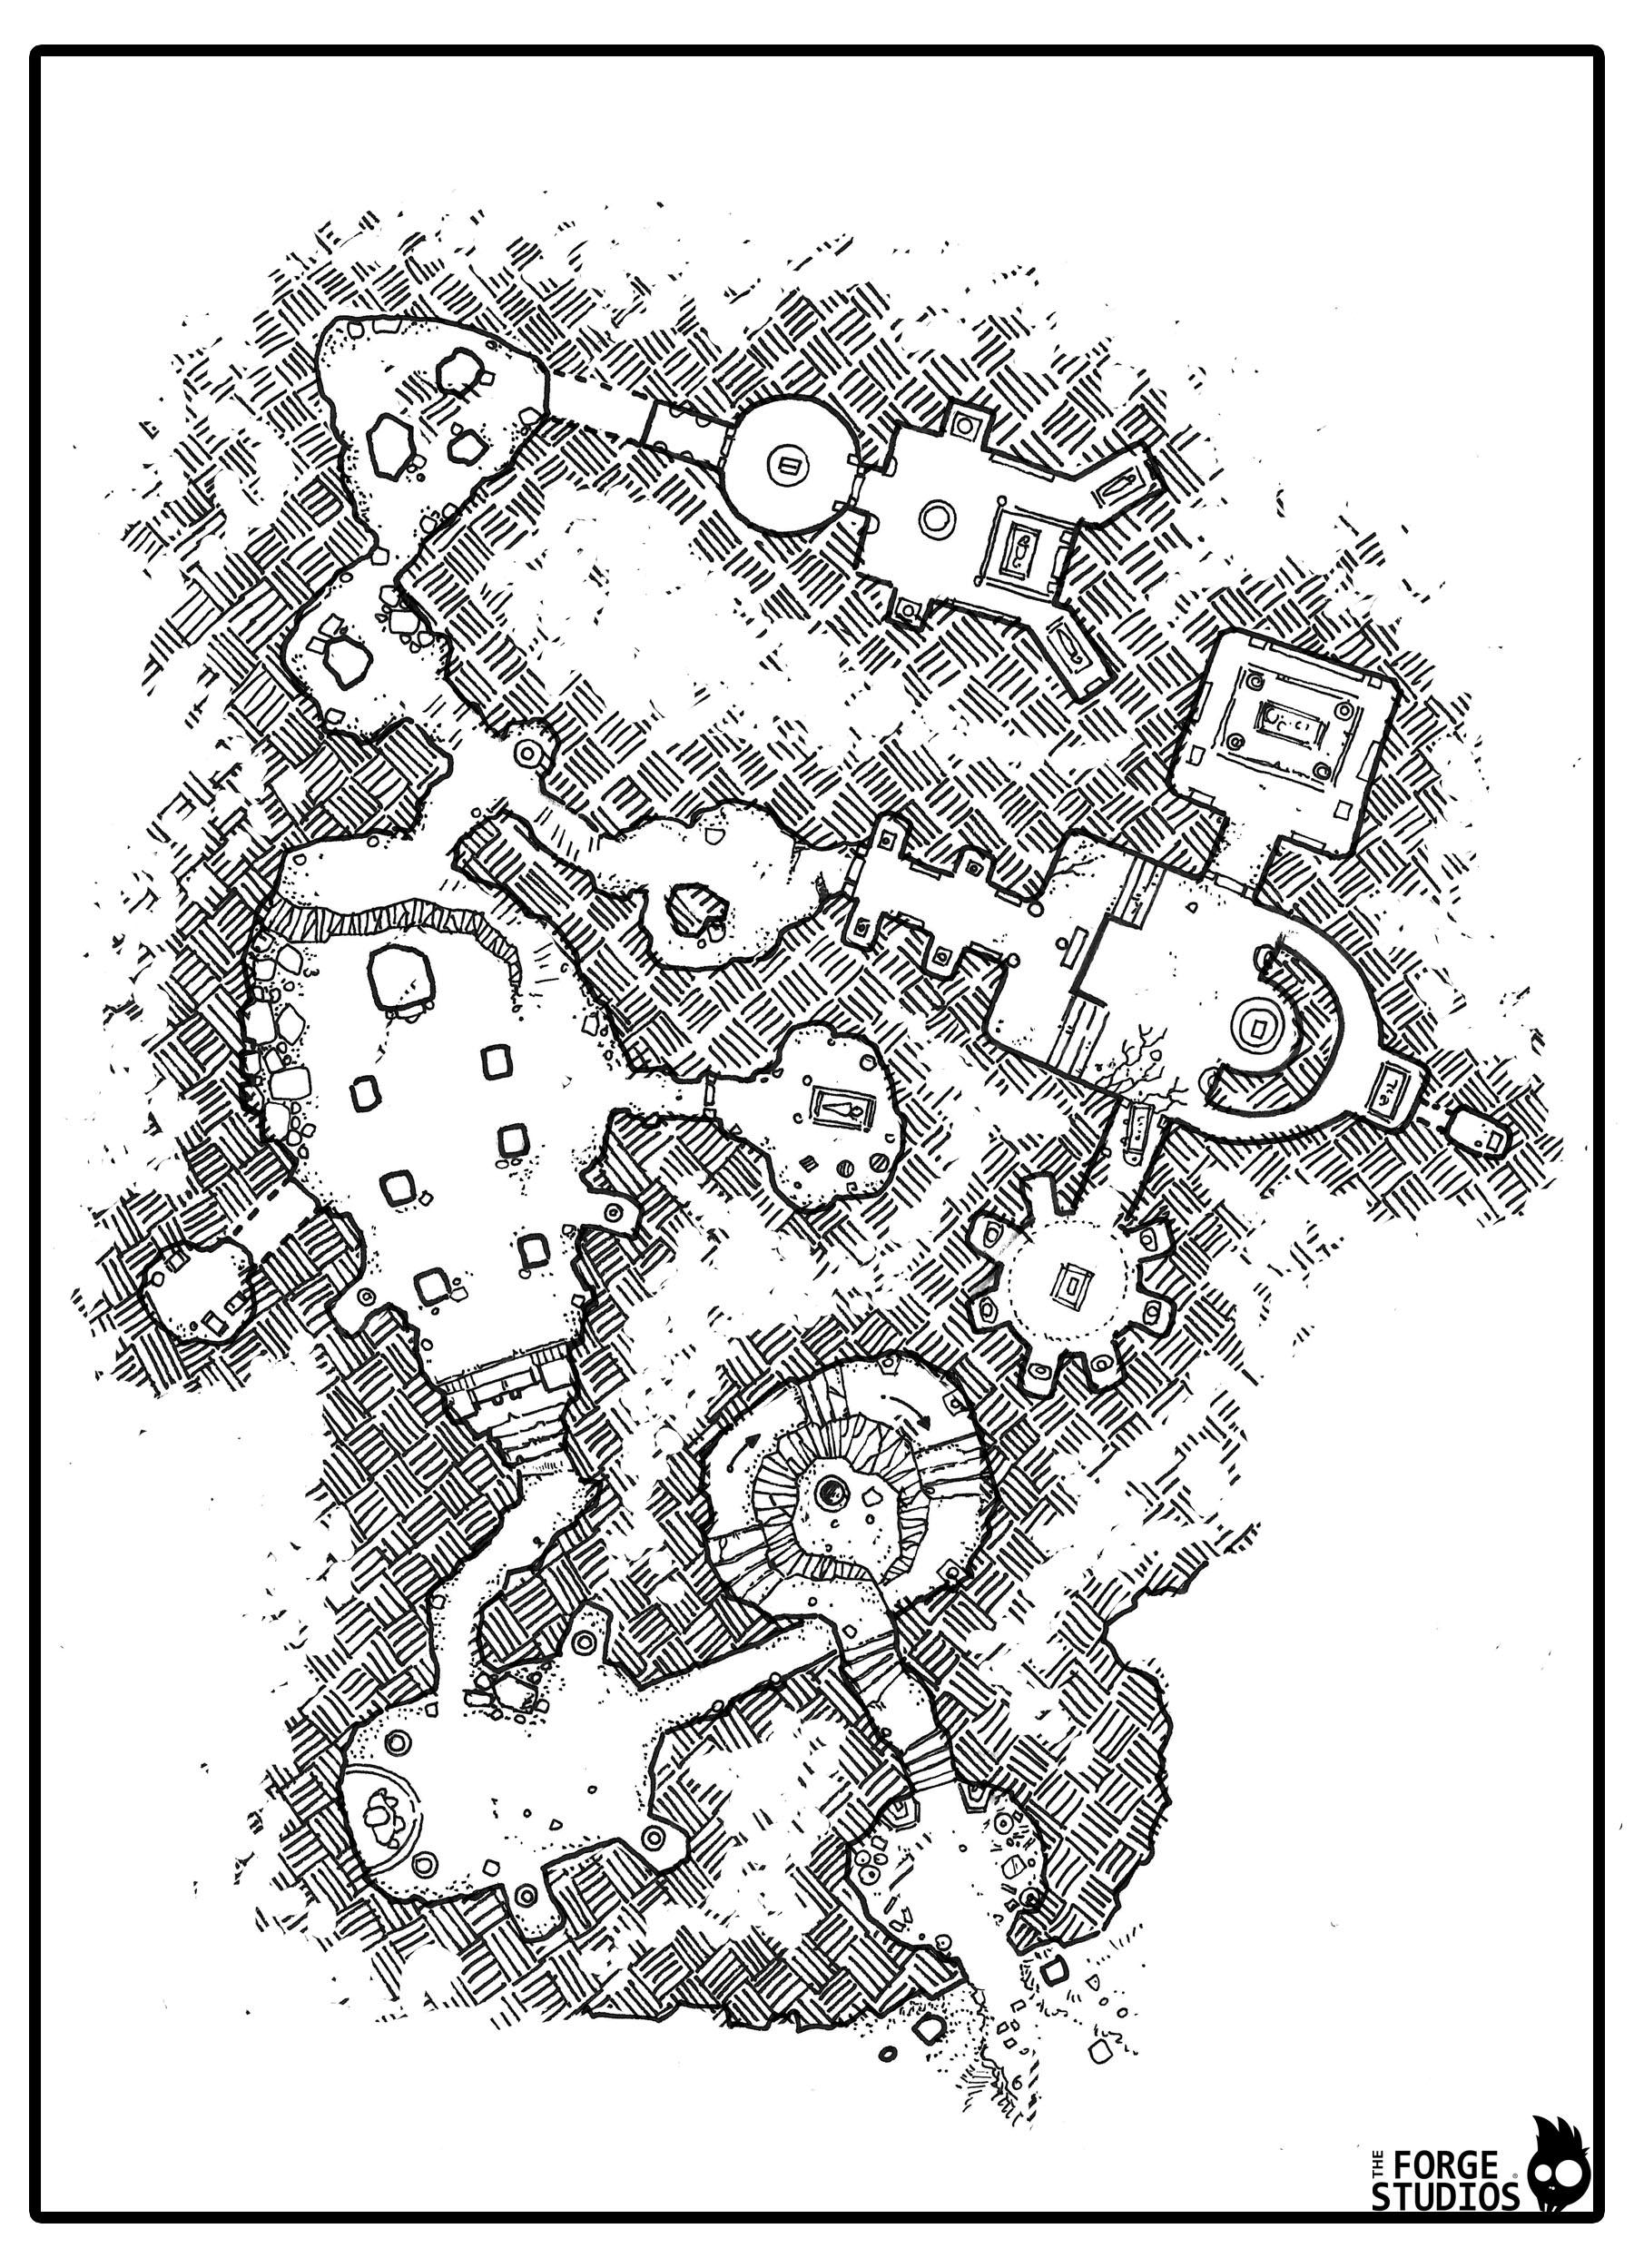 [Image: mapa_demo_1a.jpg]